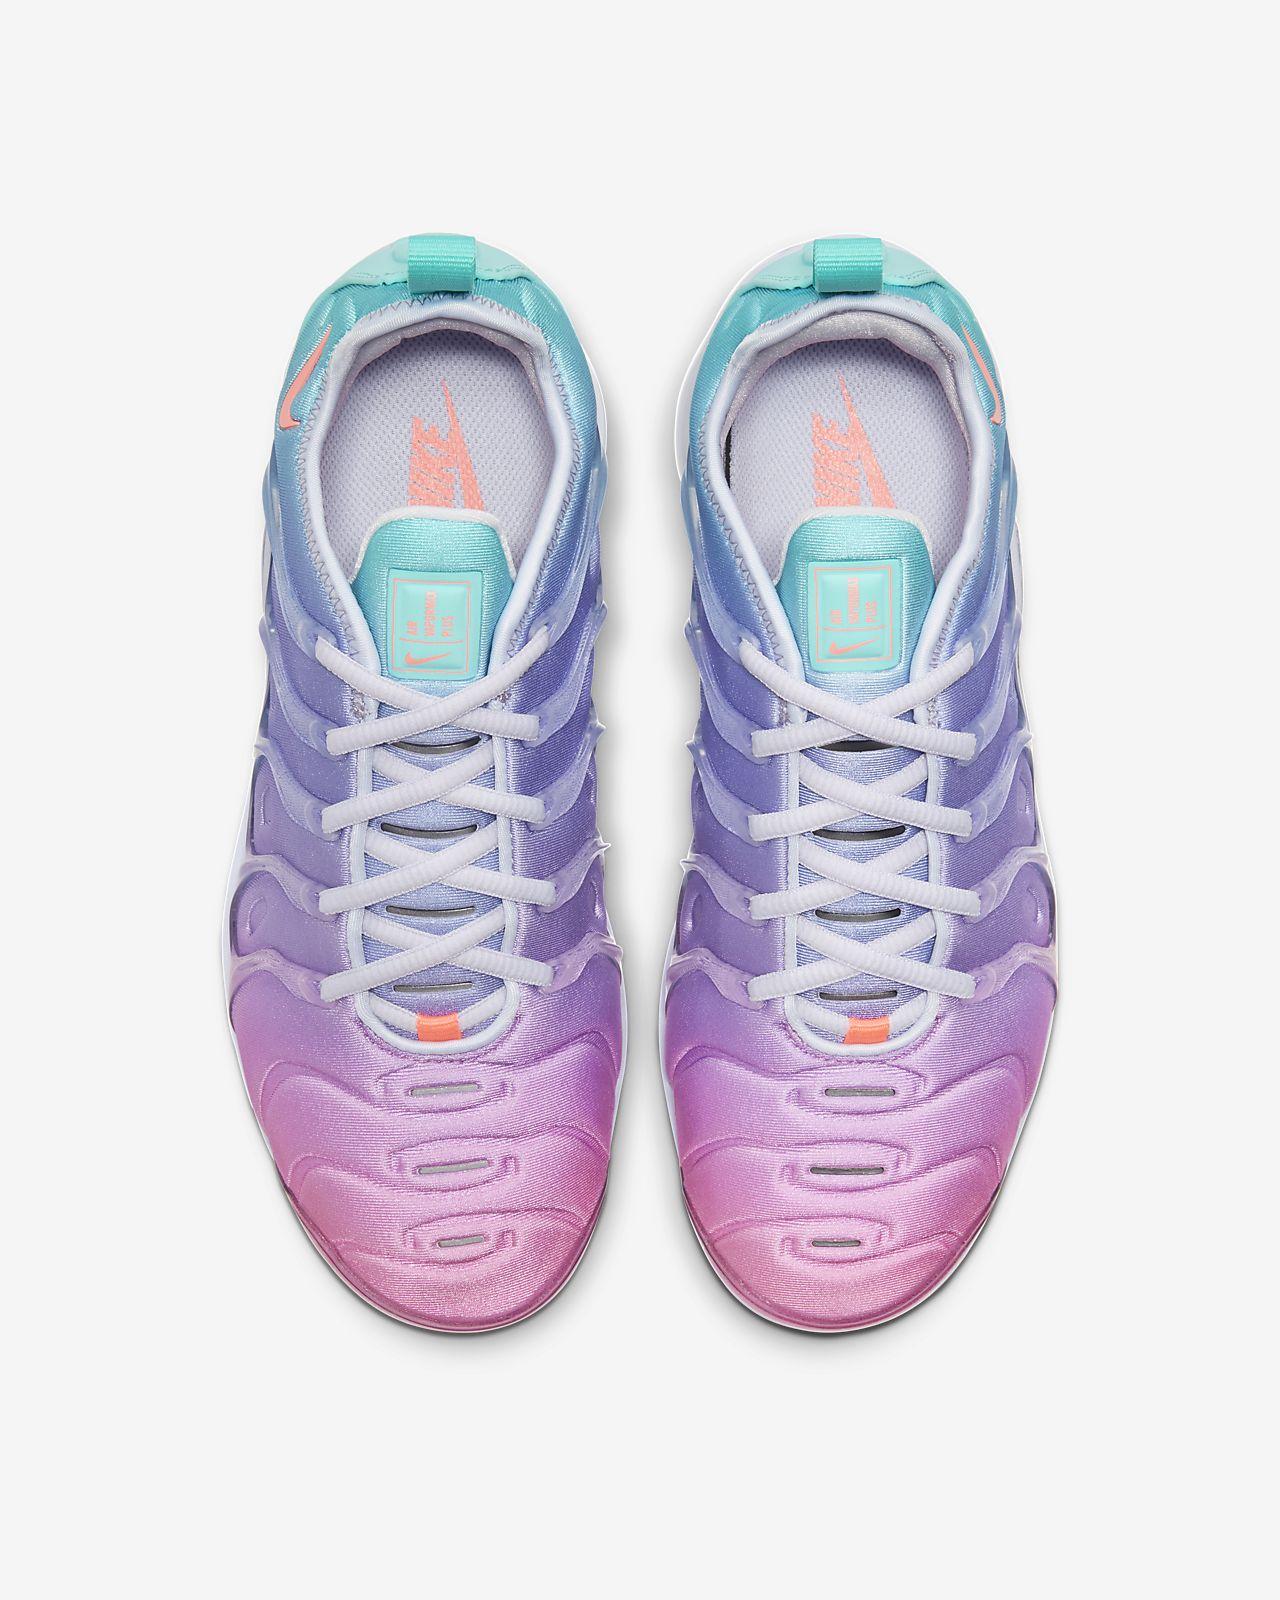 nike air vapormax plus light rózsaszín